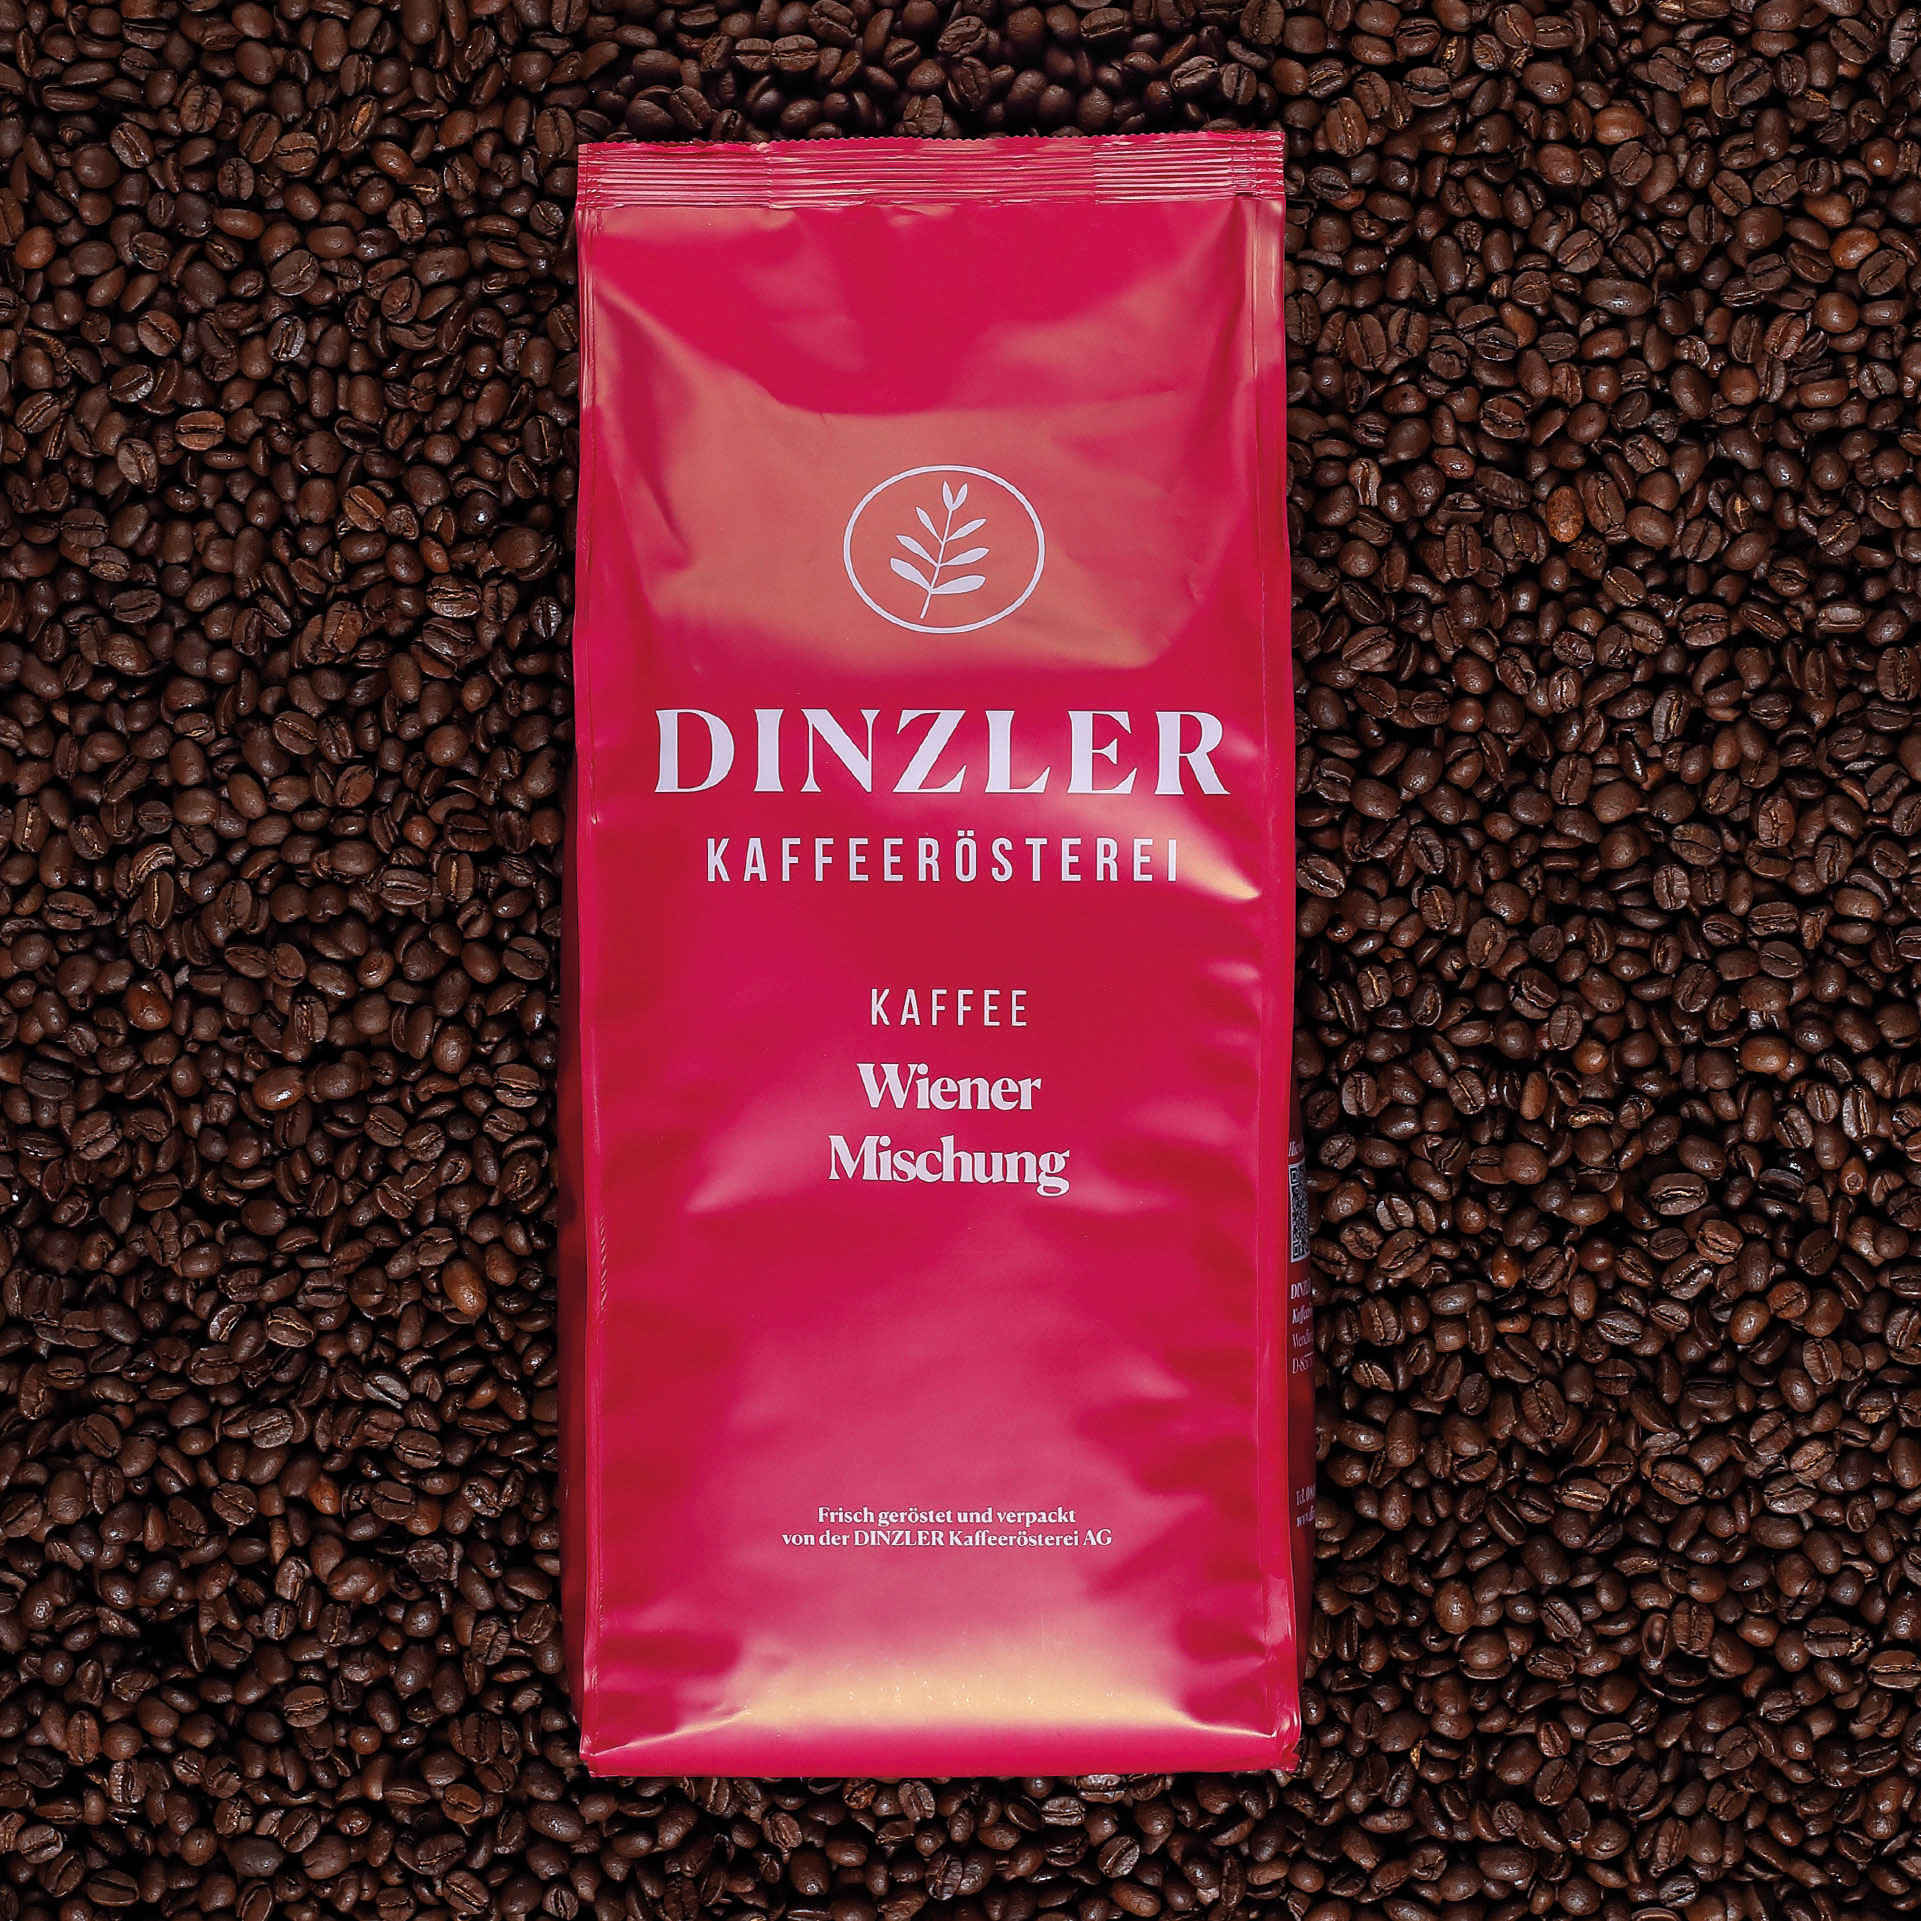 Kaffee Wiener Mischung | DINZLER Shop